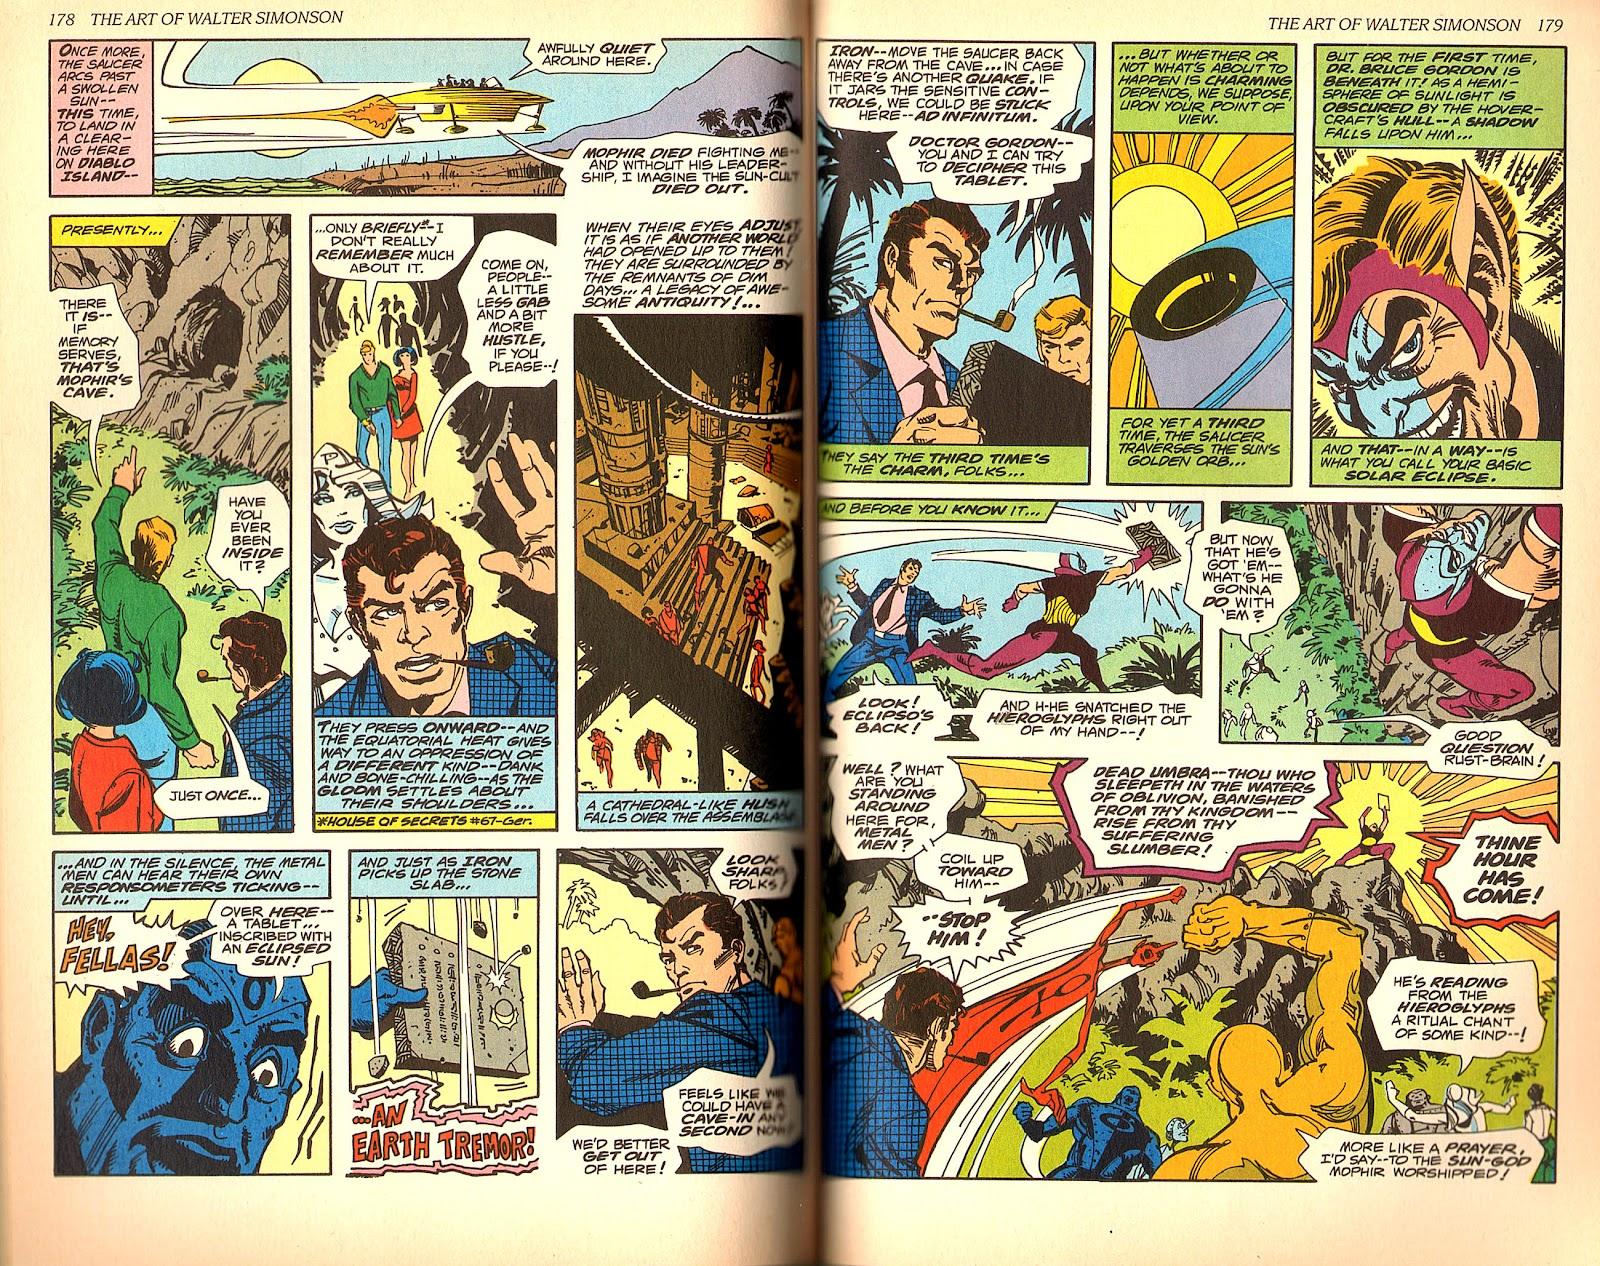 Read online The Art of Walter Simonson comic -  Issue # TPB - 91